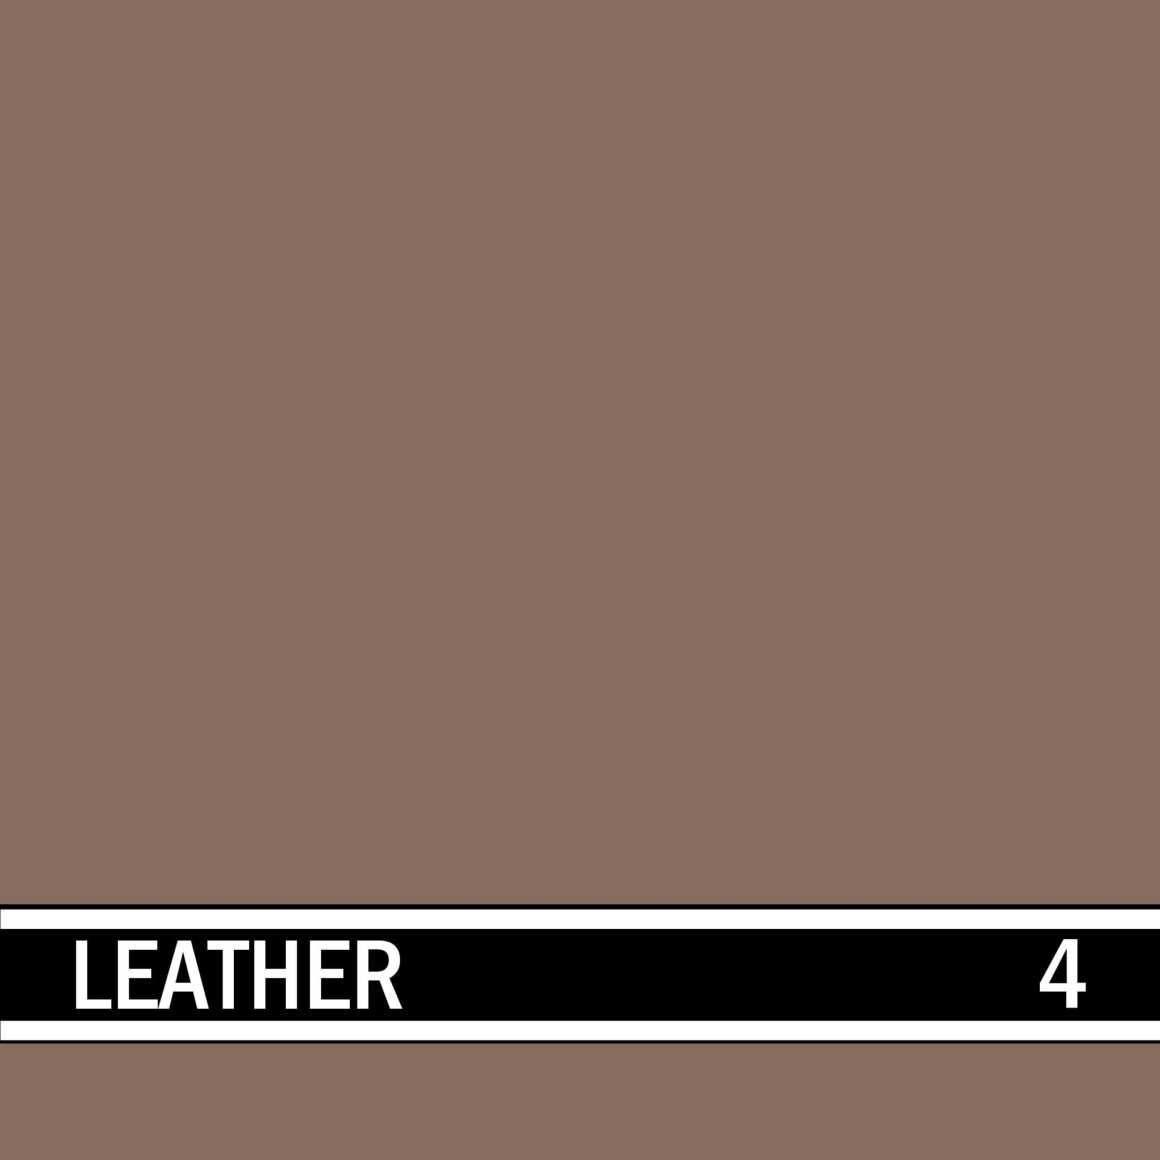 Leather integral concrete color for stamped concrete and decorative colored concrete